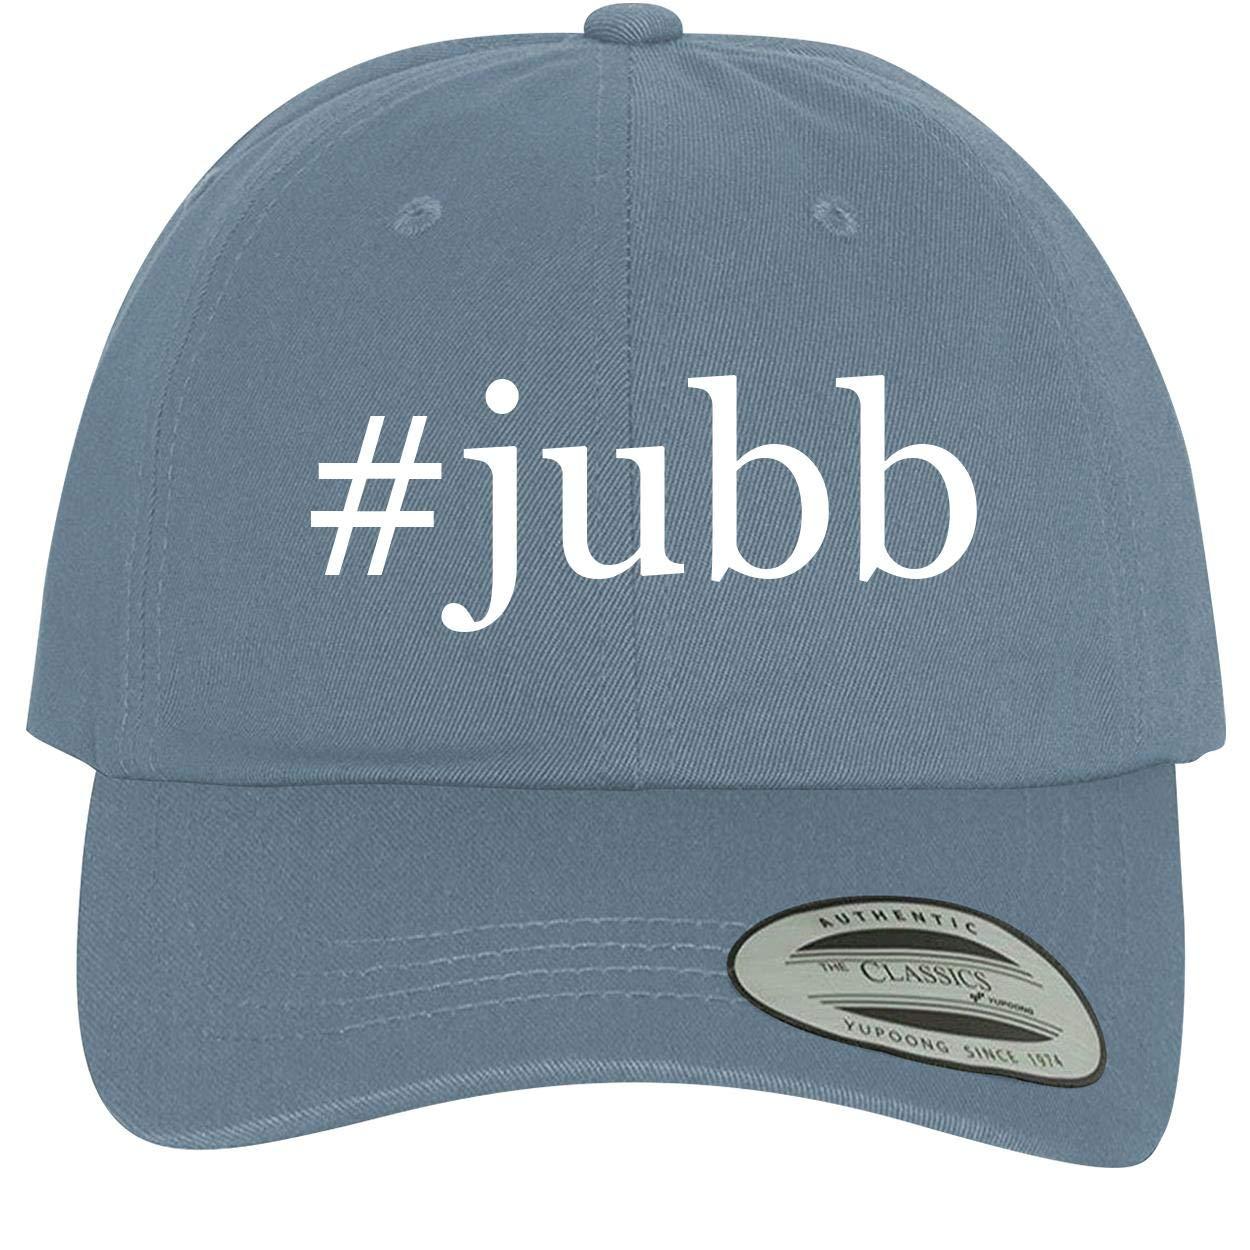 BH Cool Designs #jubb Comfortable Dad Hat Baseball Cap